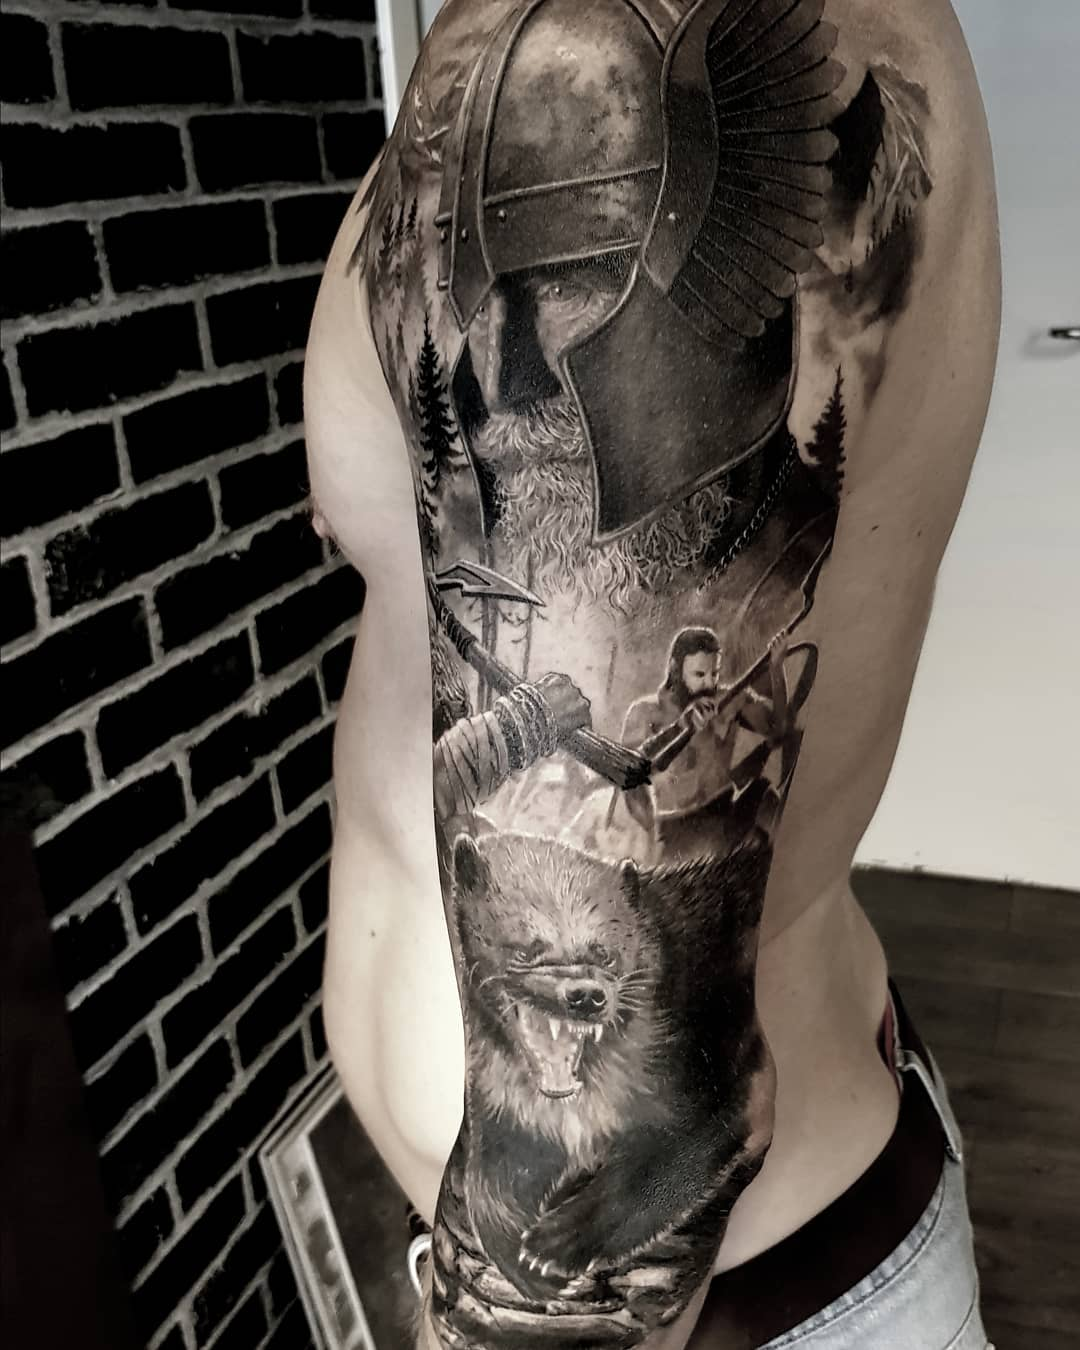 tattoo by @inkbyoskar